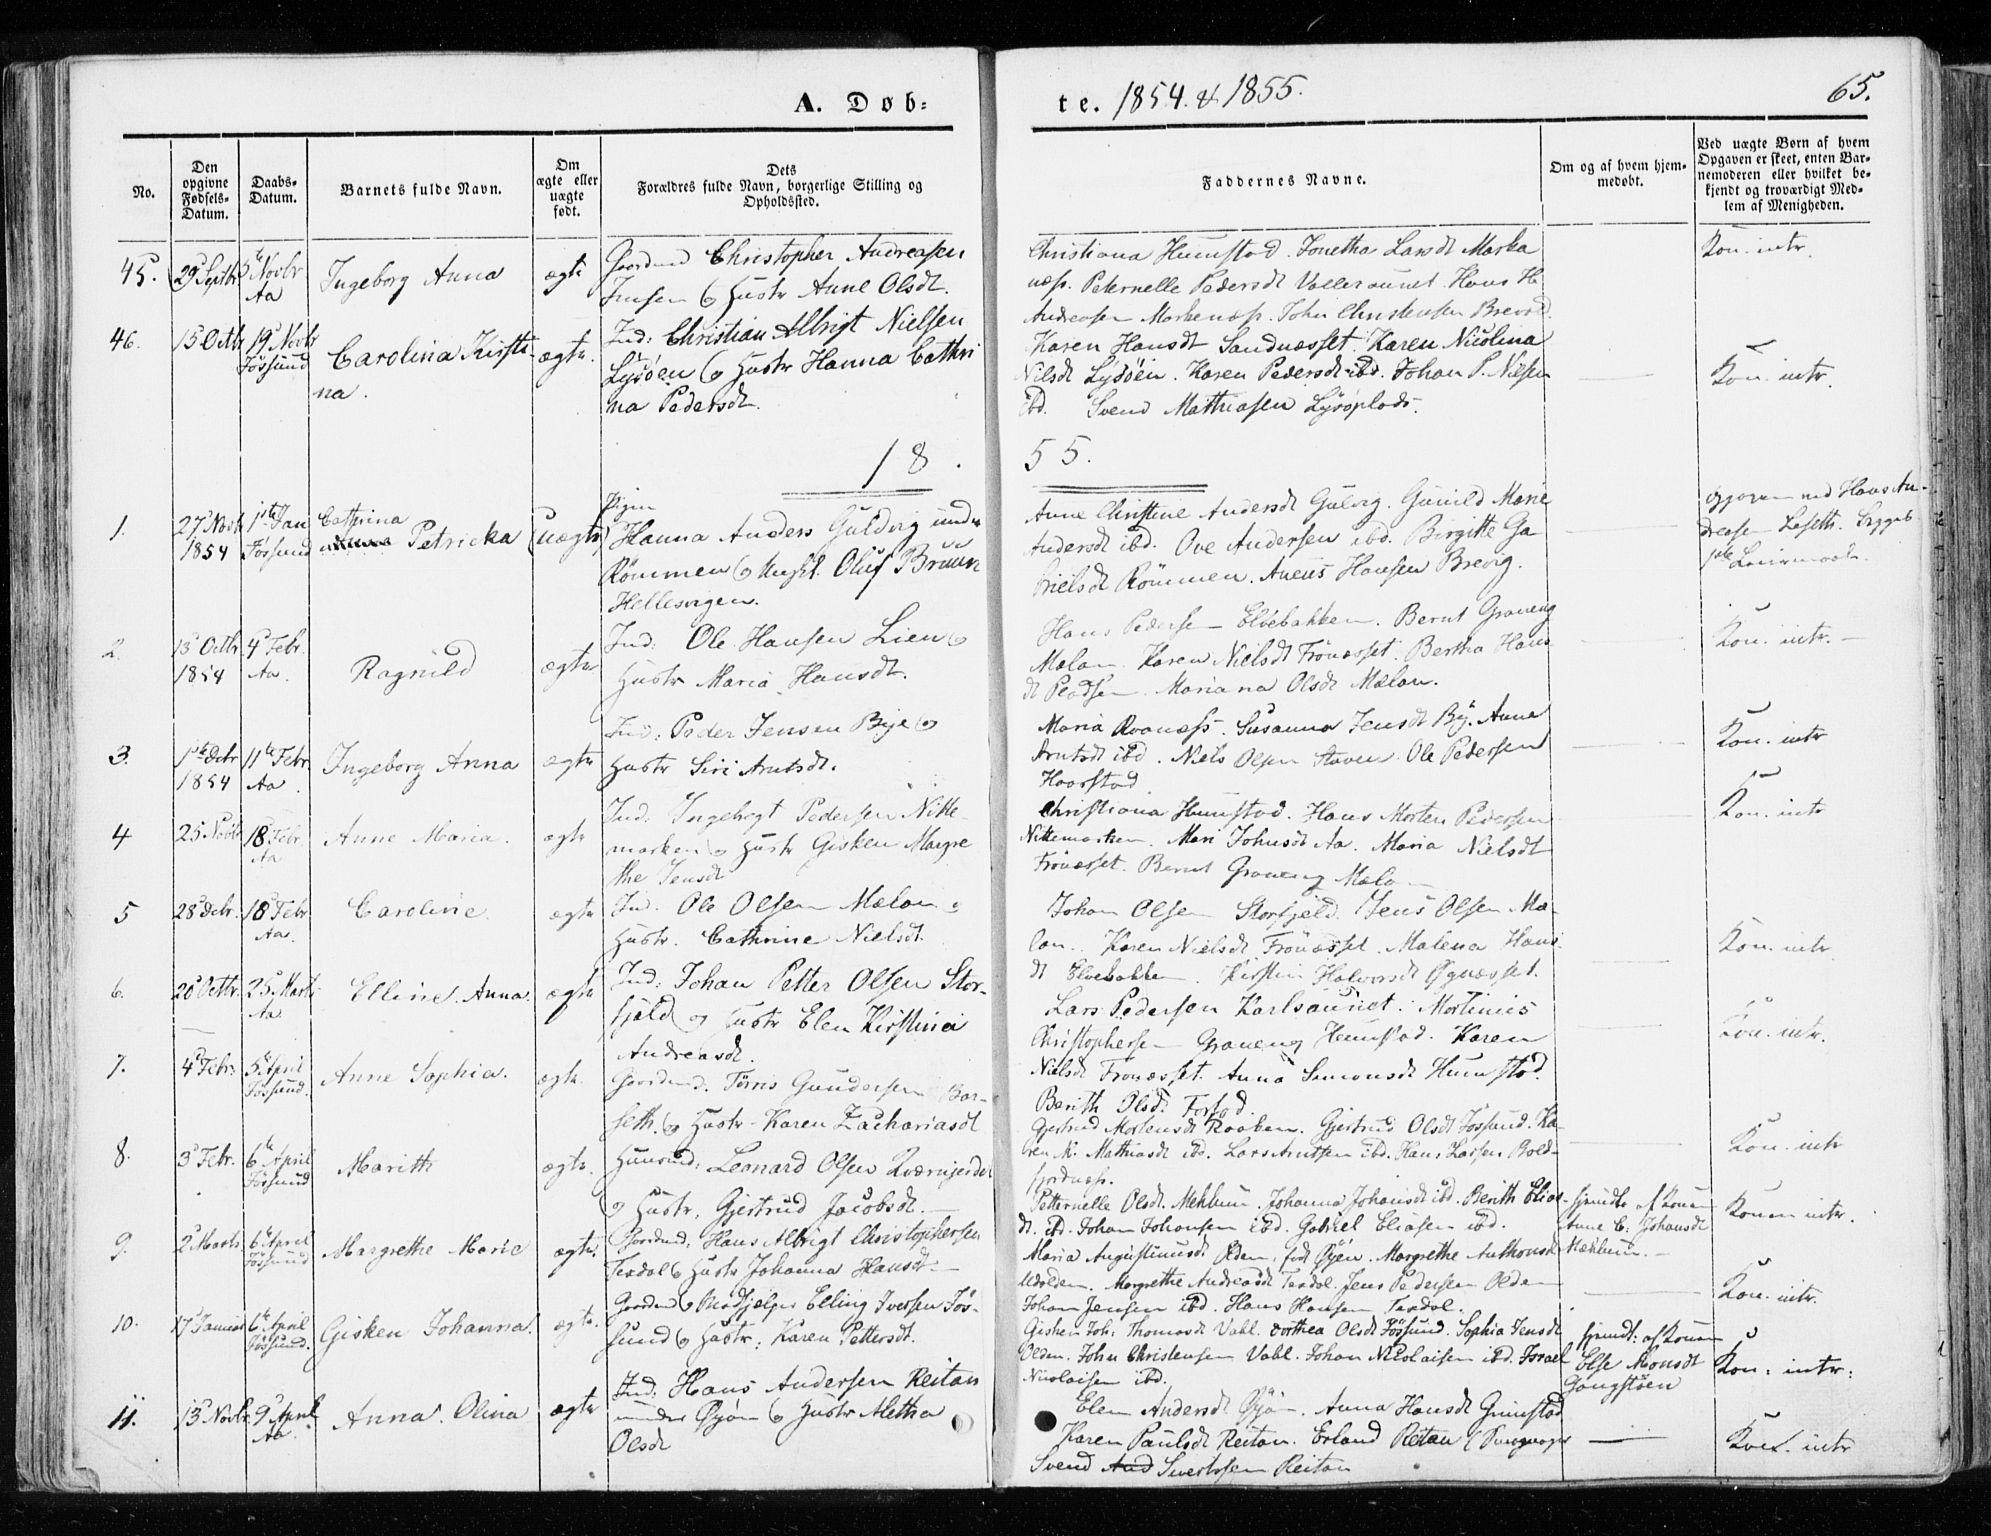 SAT, Ministerialprotokoller, klokkerbøker og fødselsregistre - Sør-Trøndelag, 655/L0677: Parish register (official) no. 655A06, 1847-1860, p. 65